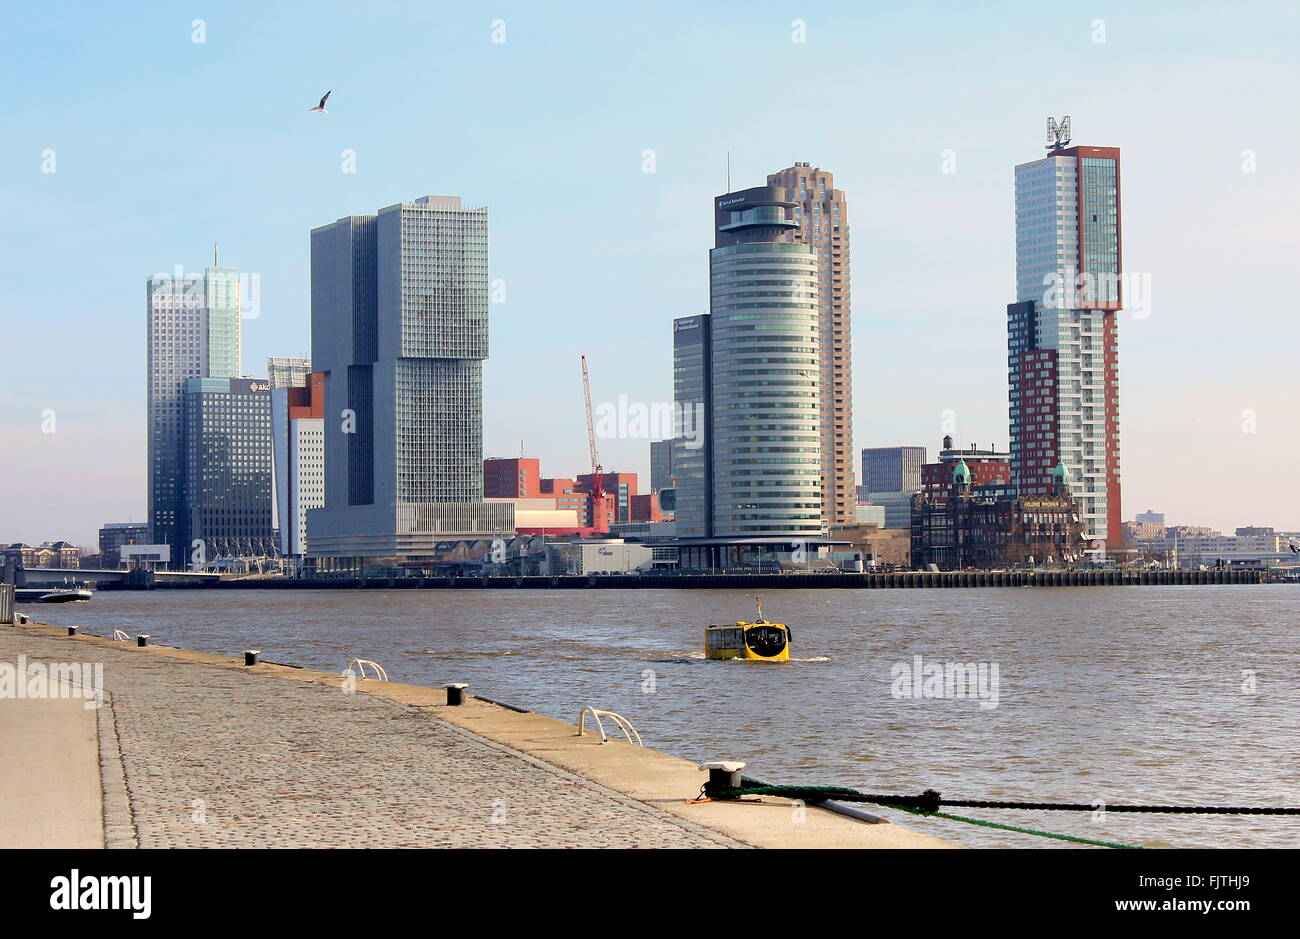 Iconic Rotterdam skyline. Maastoren (Deloitte HQ), De Rotterdam, World Port center & Montevideo skyscrapers - Stock Image